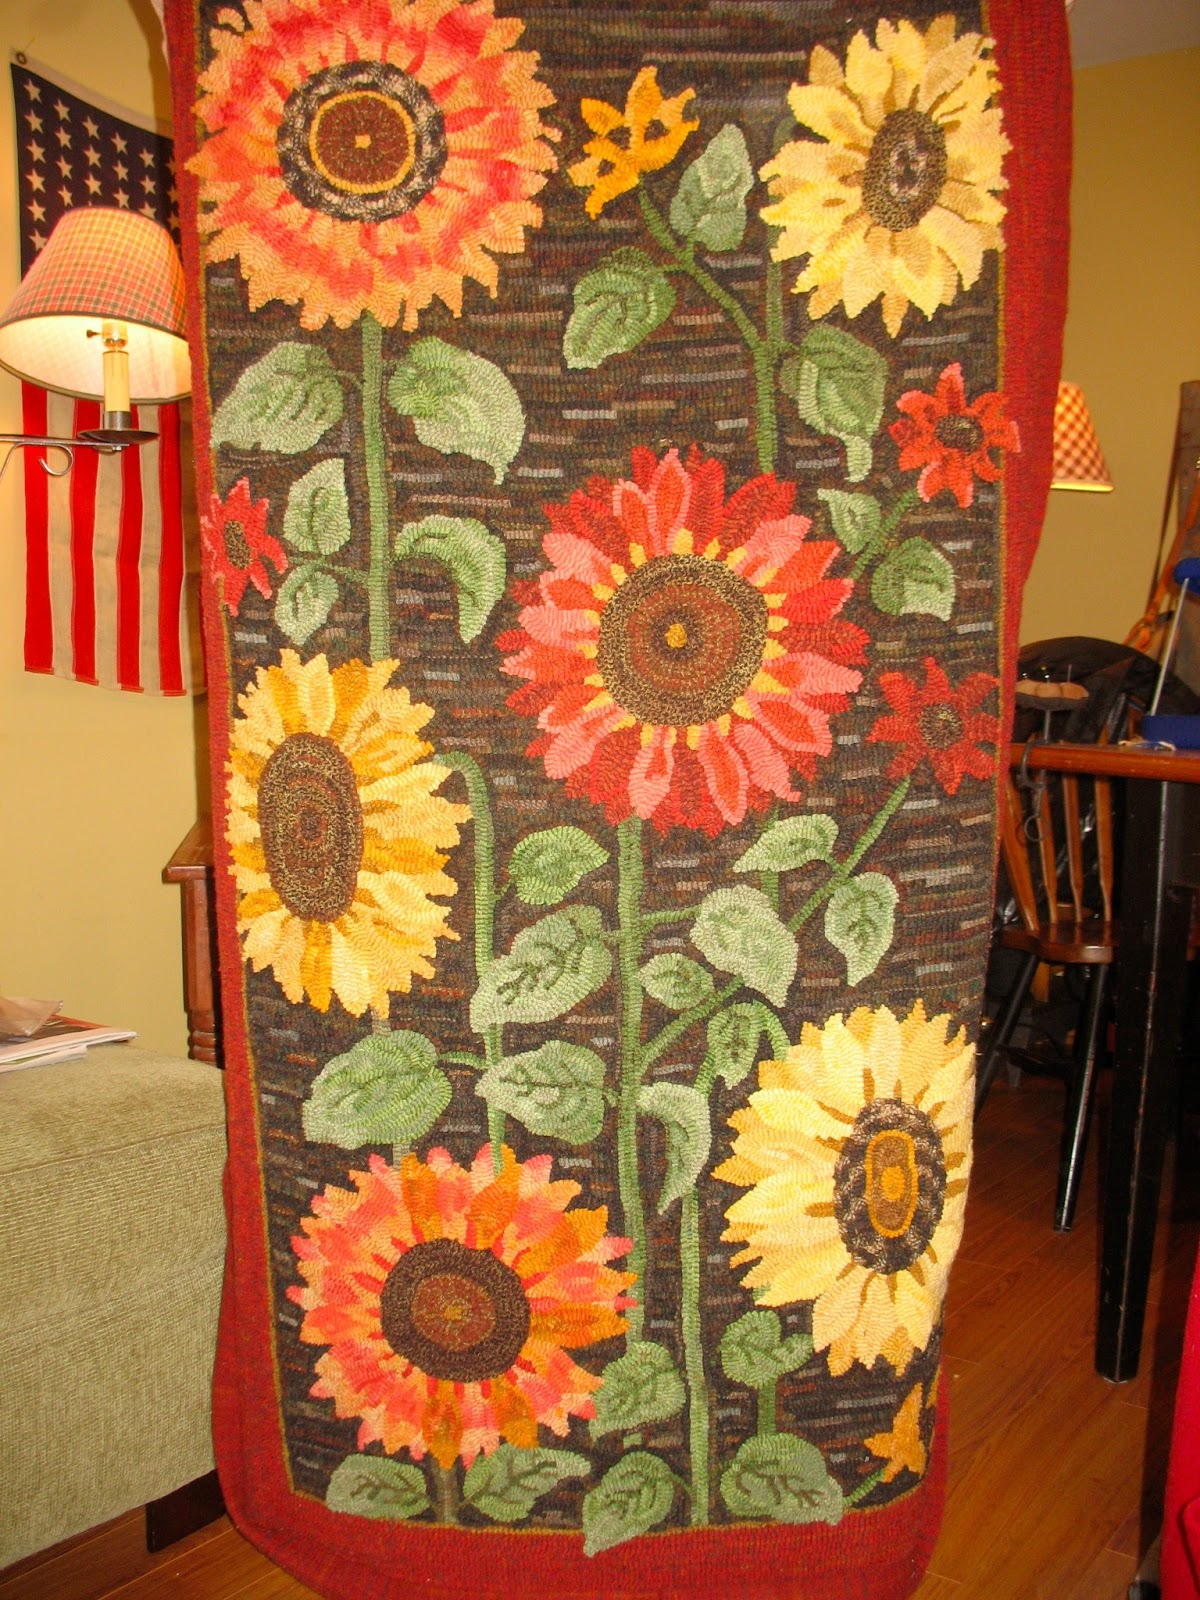 ANITA HOOKS RUGS: April 2013 - Sunflower Rugs